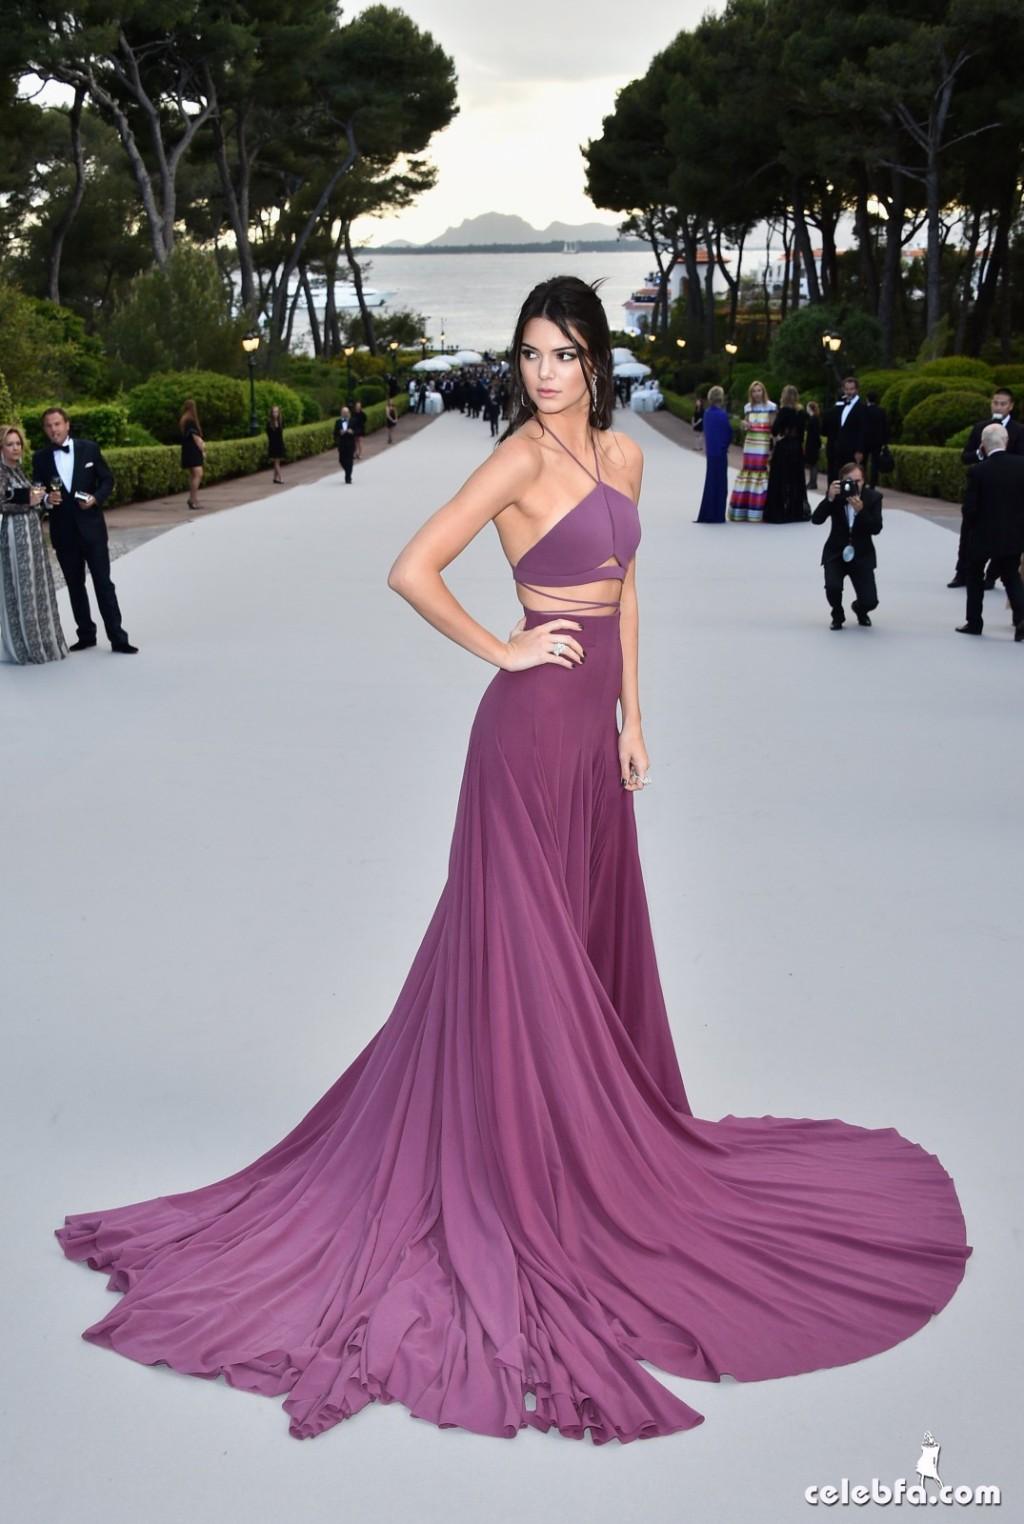 Kendall_Jenner_amfAR's Cannes Gala (3)